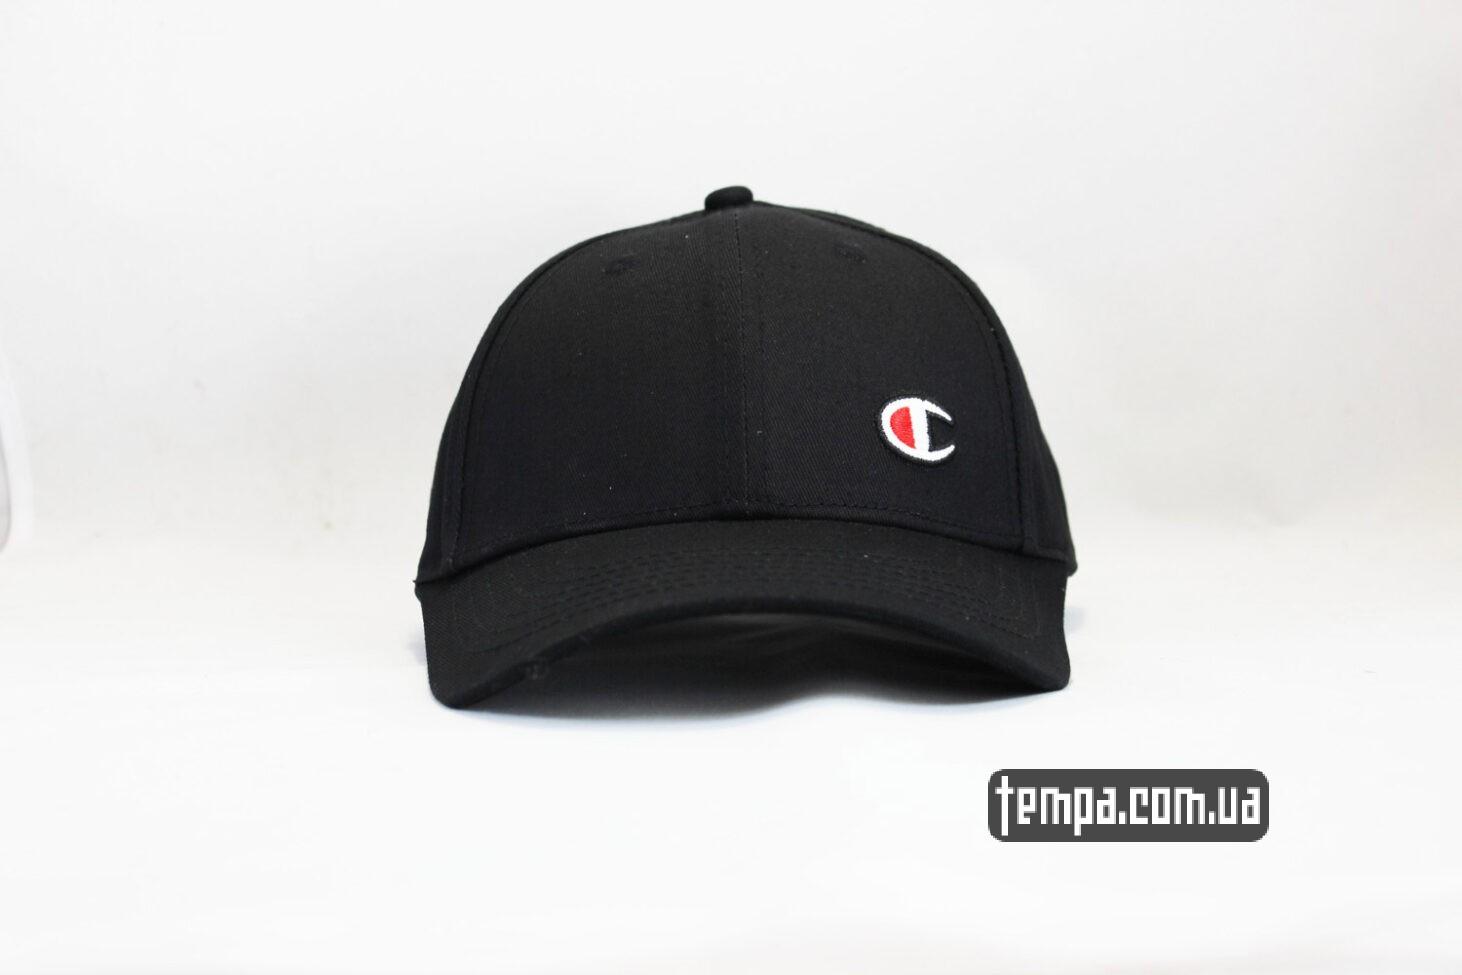 кепка бейсболка Champion черная логотип сбоку-2